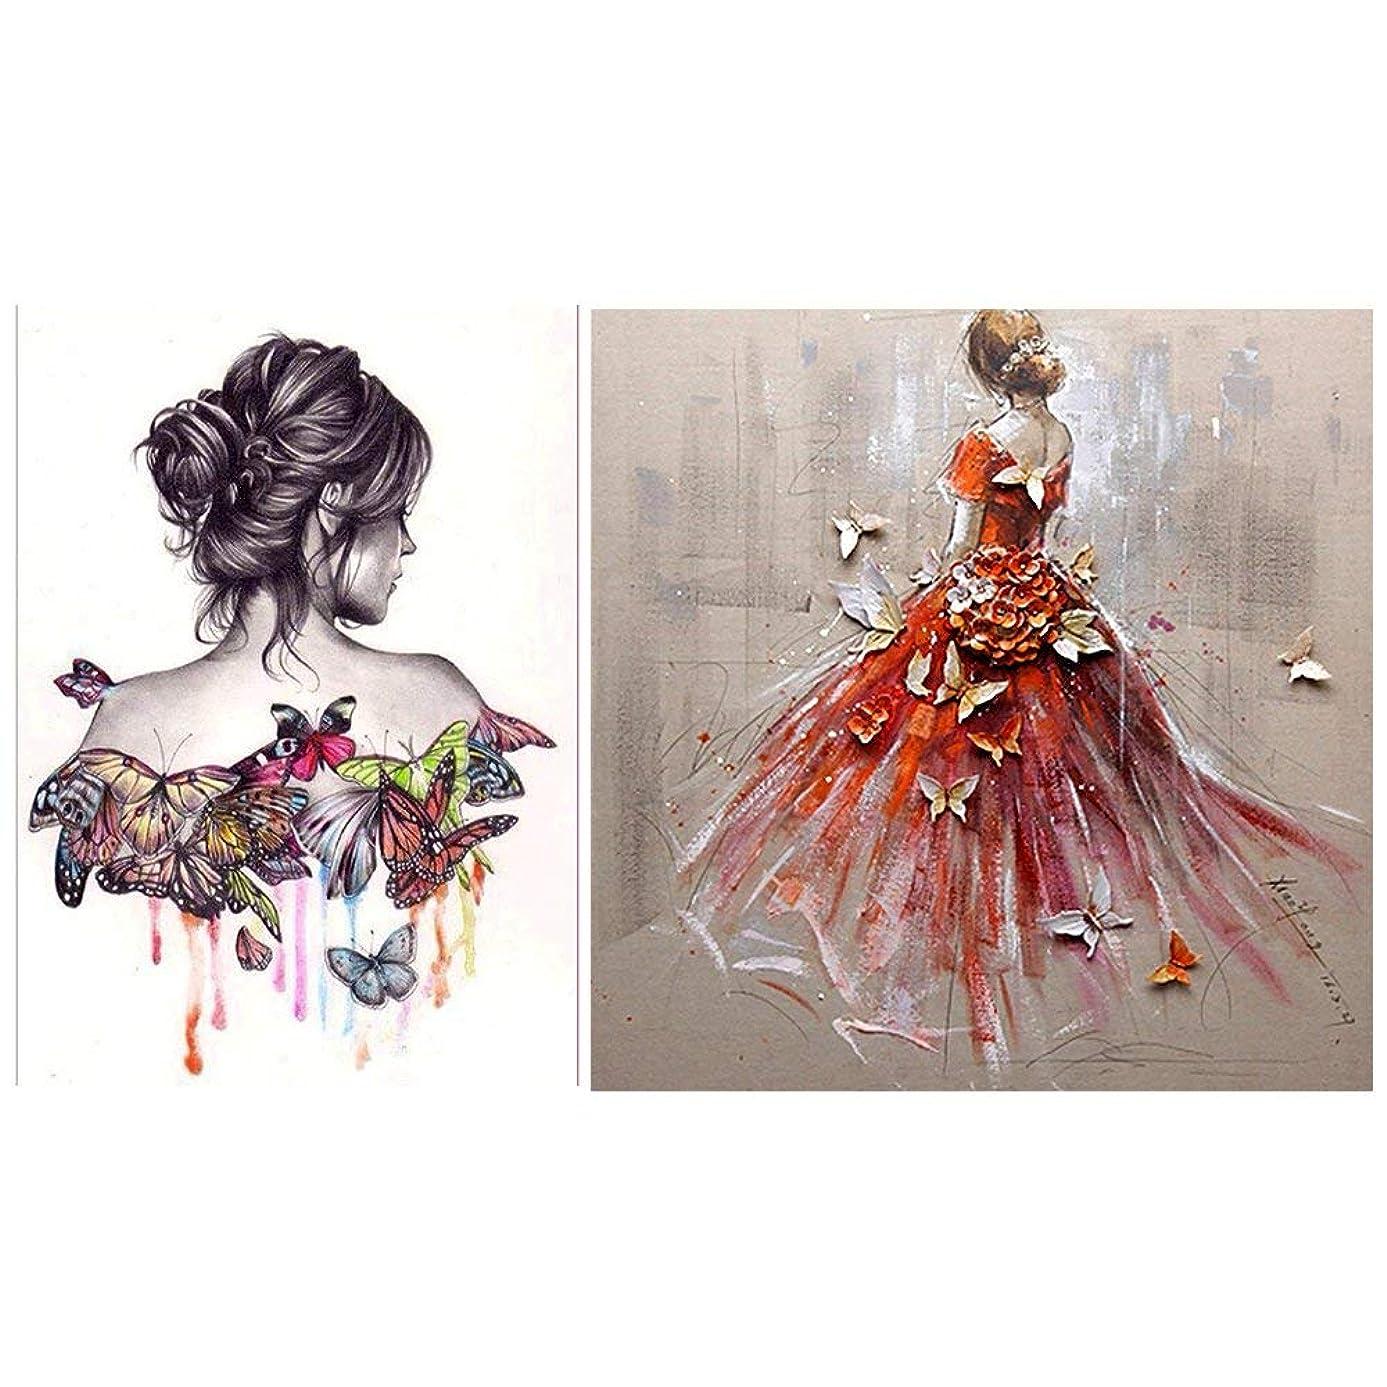 Owfvlazi DIY 5D Diamond Painting Butterfly Girls by Number Kits Full Drill Crystal Rhinestone Diamond 12